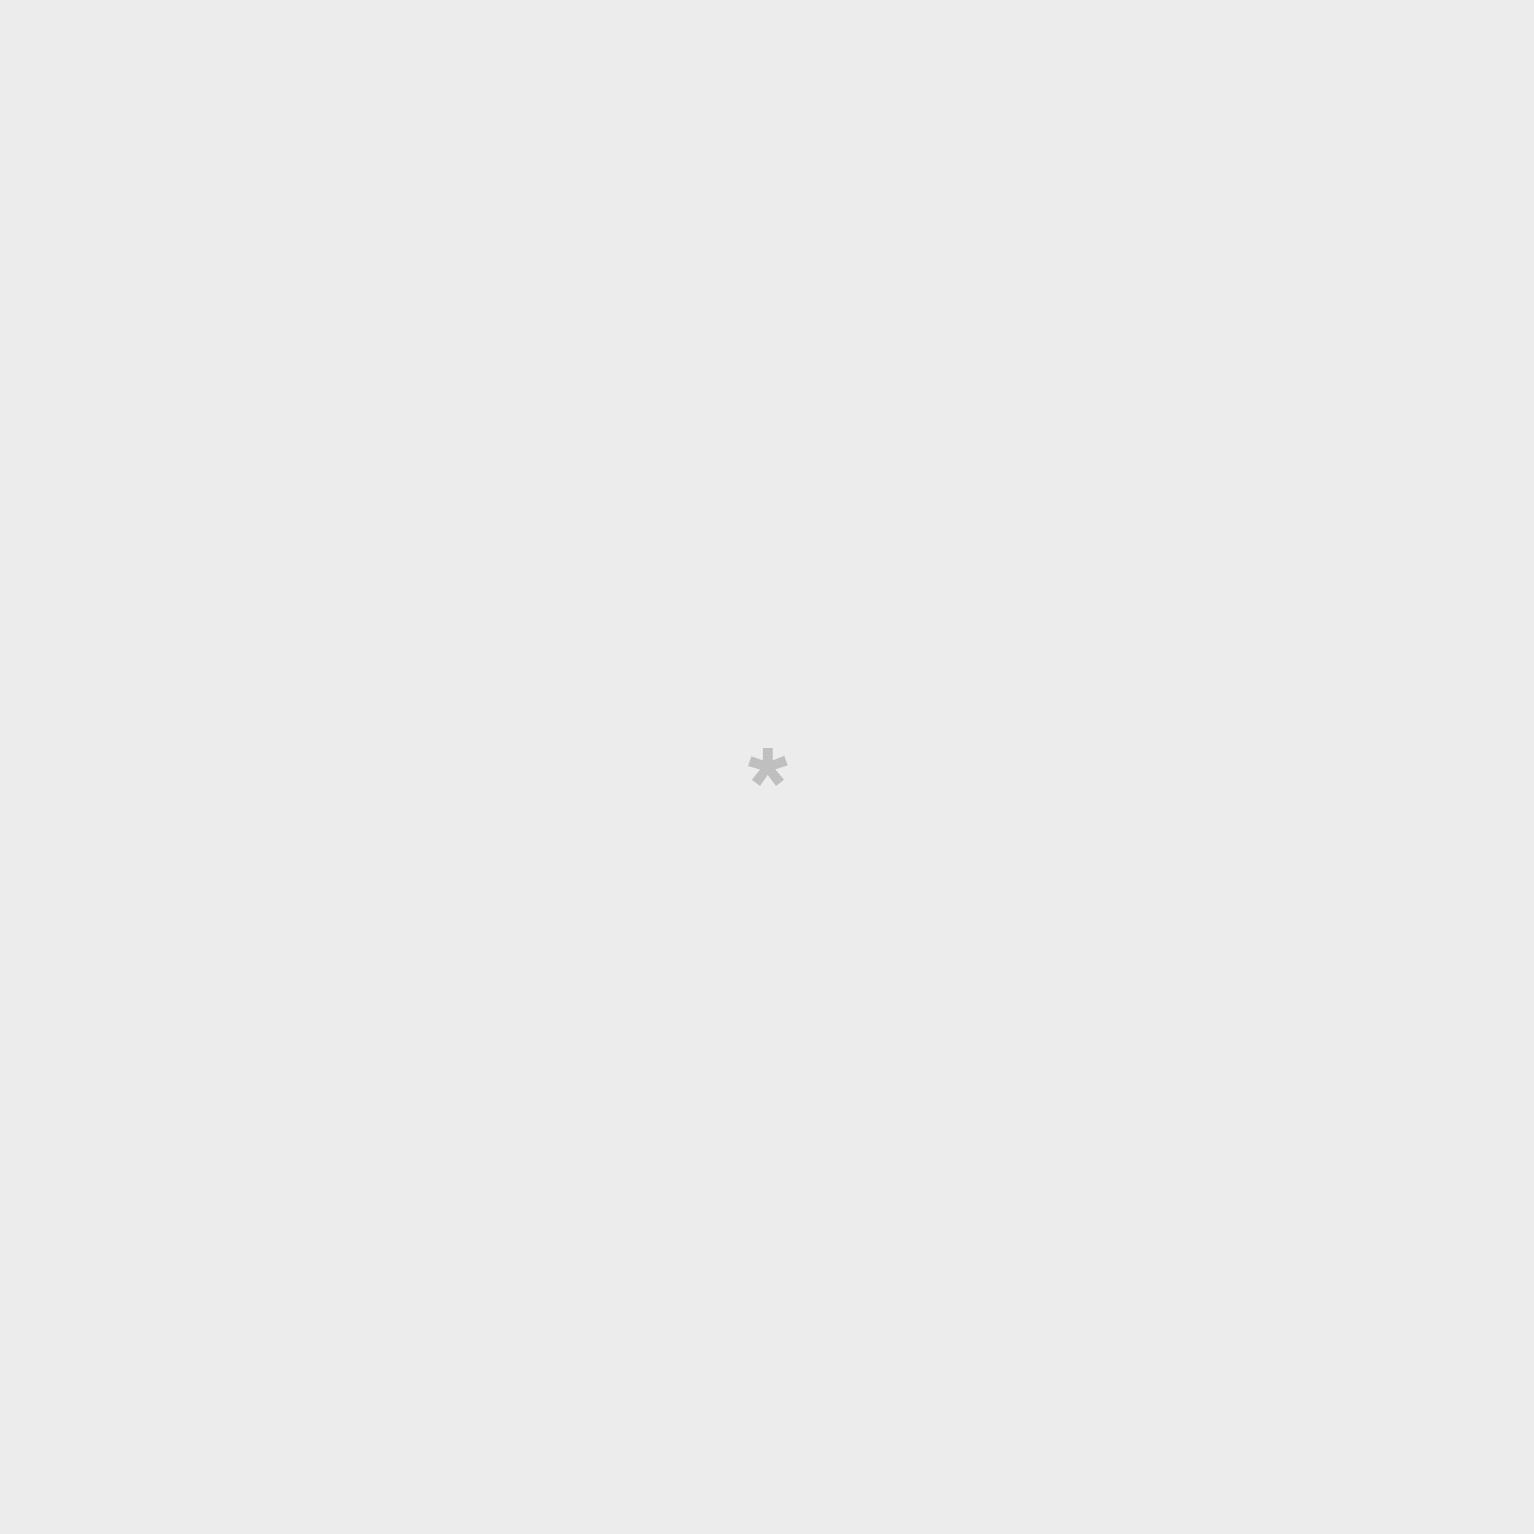 Vela - Eres mi compañera de aventuras fav..  - Sweet Cotton